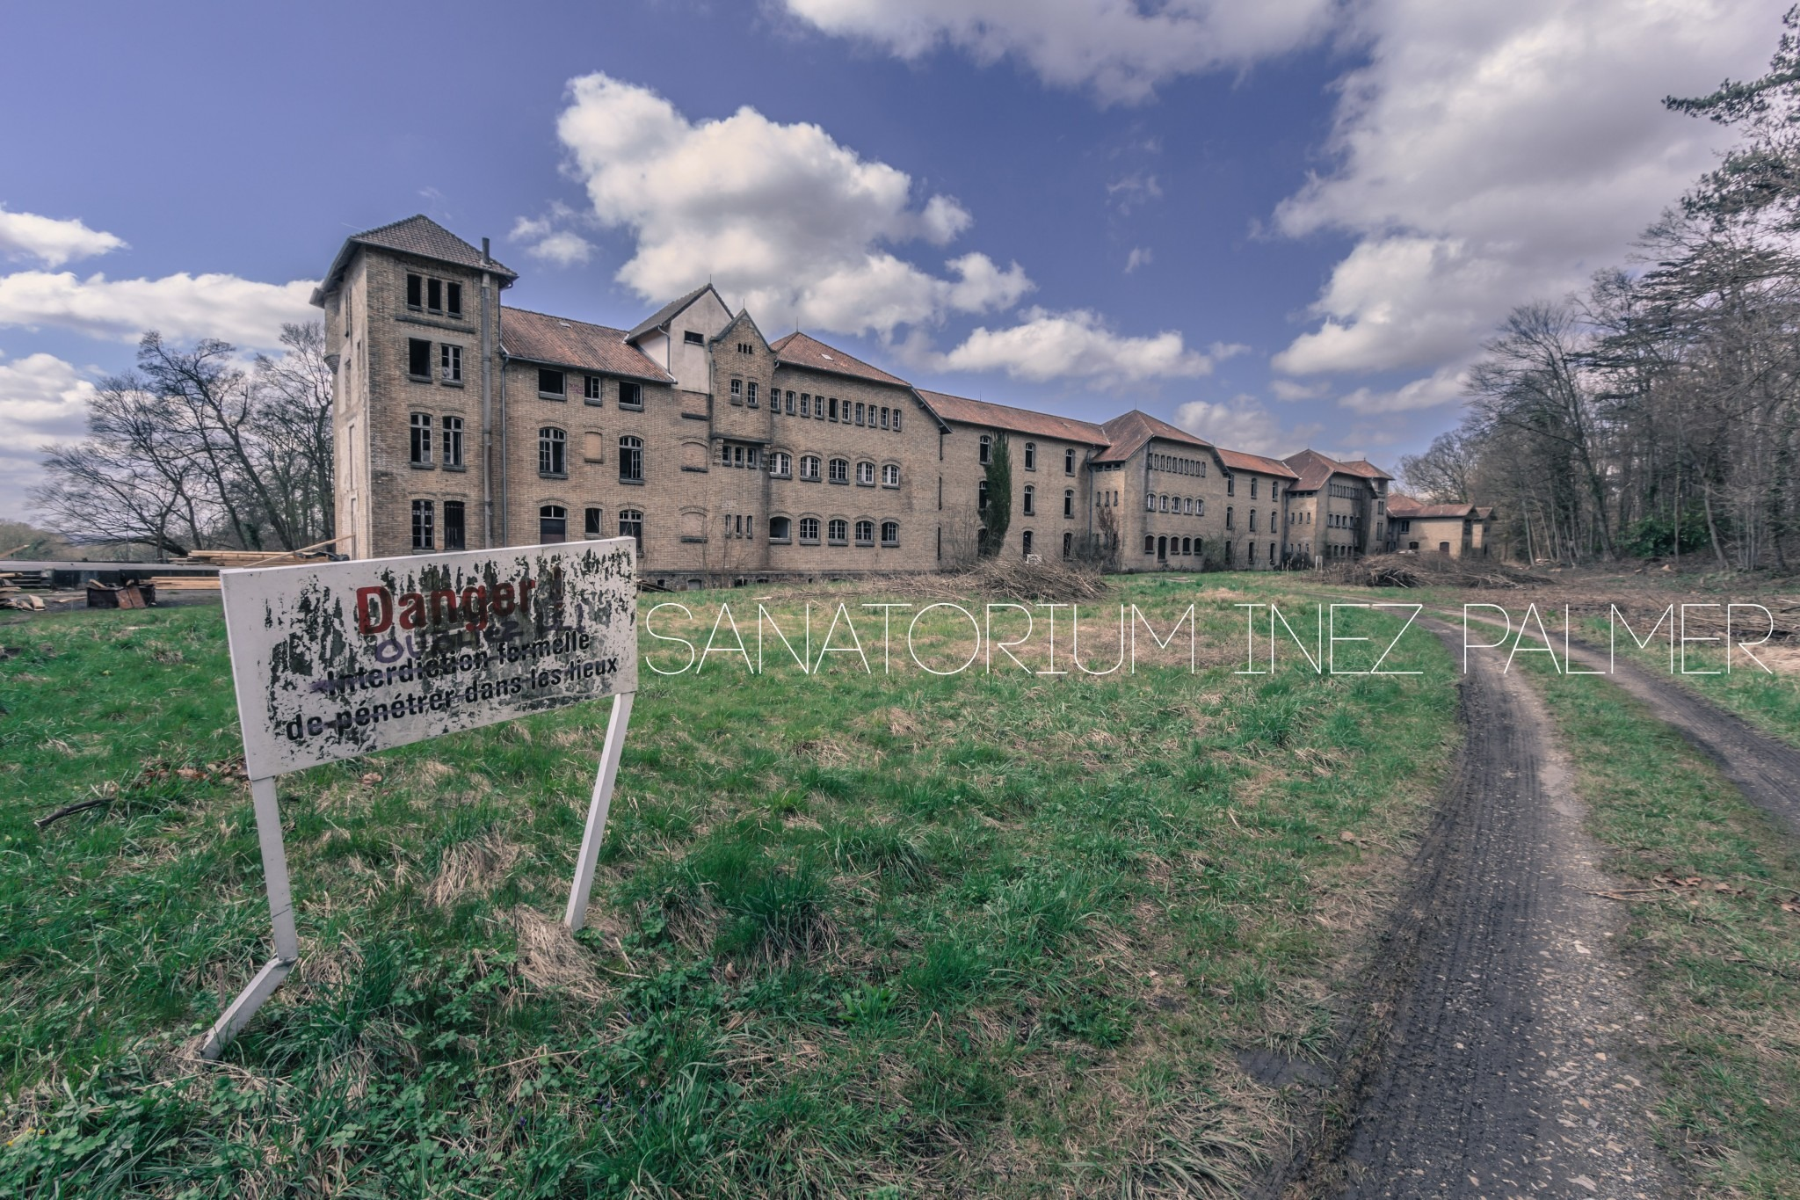 sanatorium-inez-palmer-0